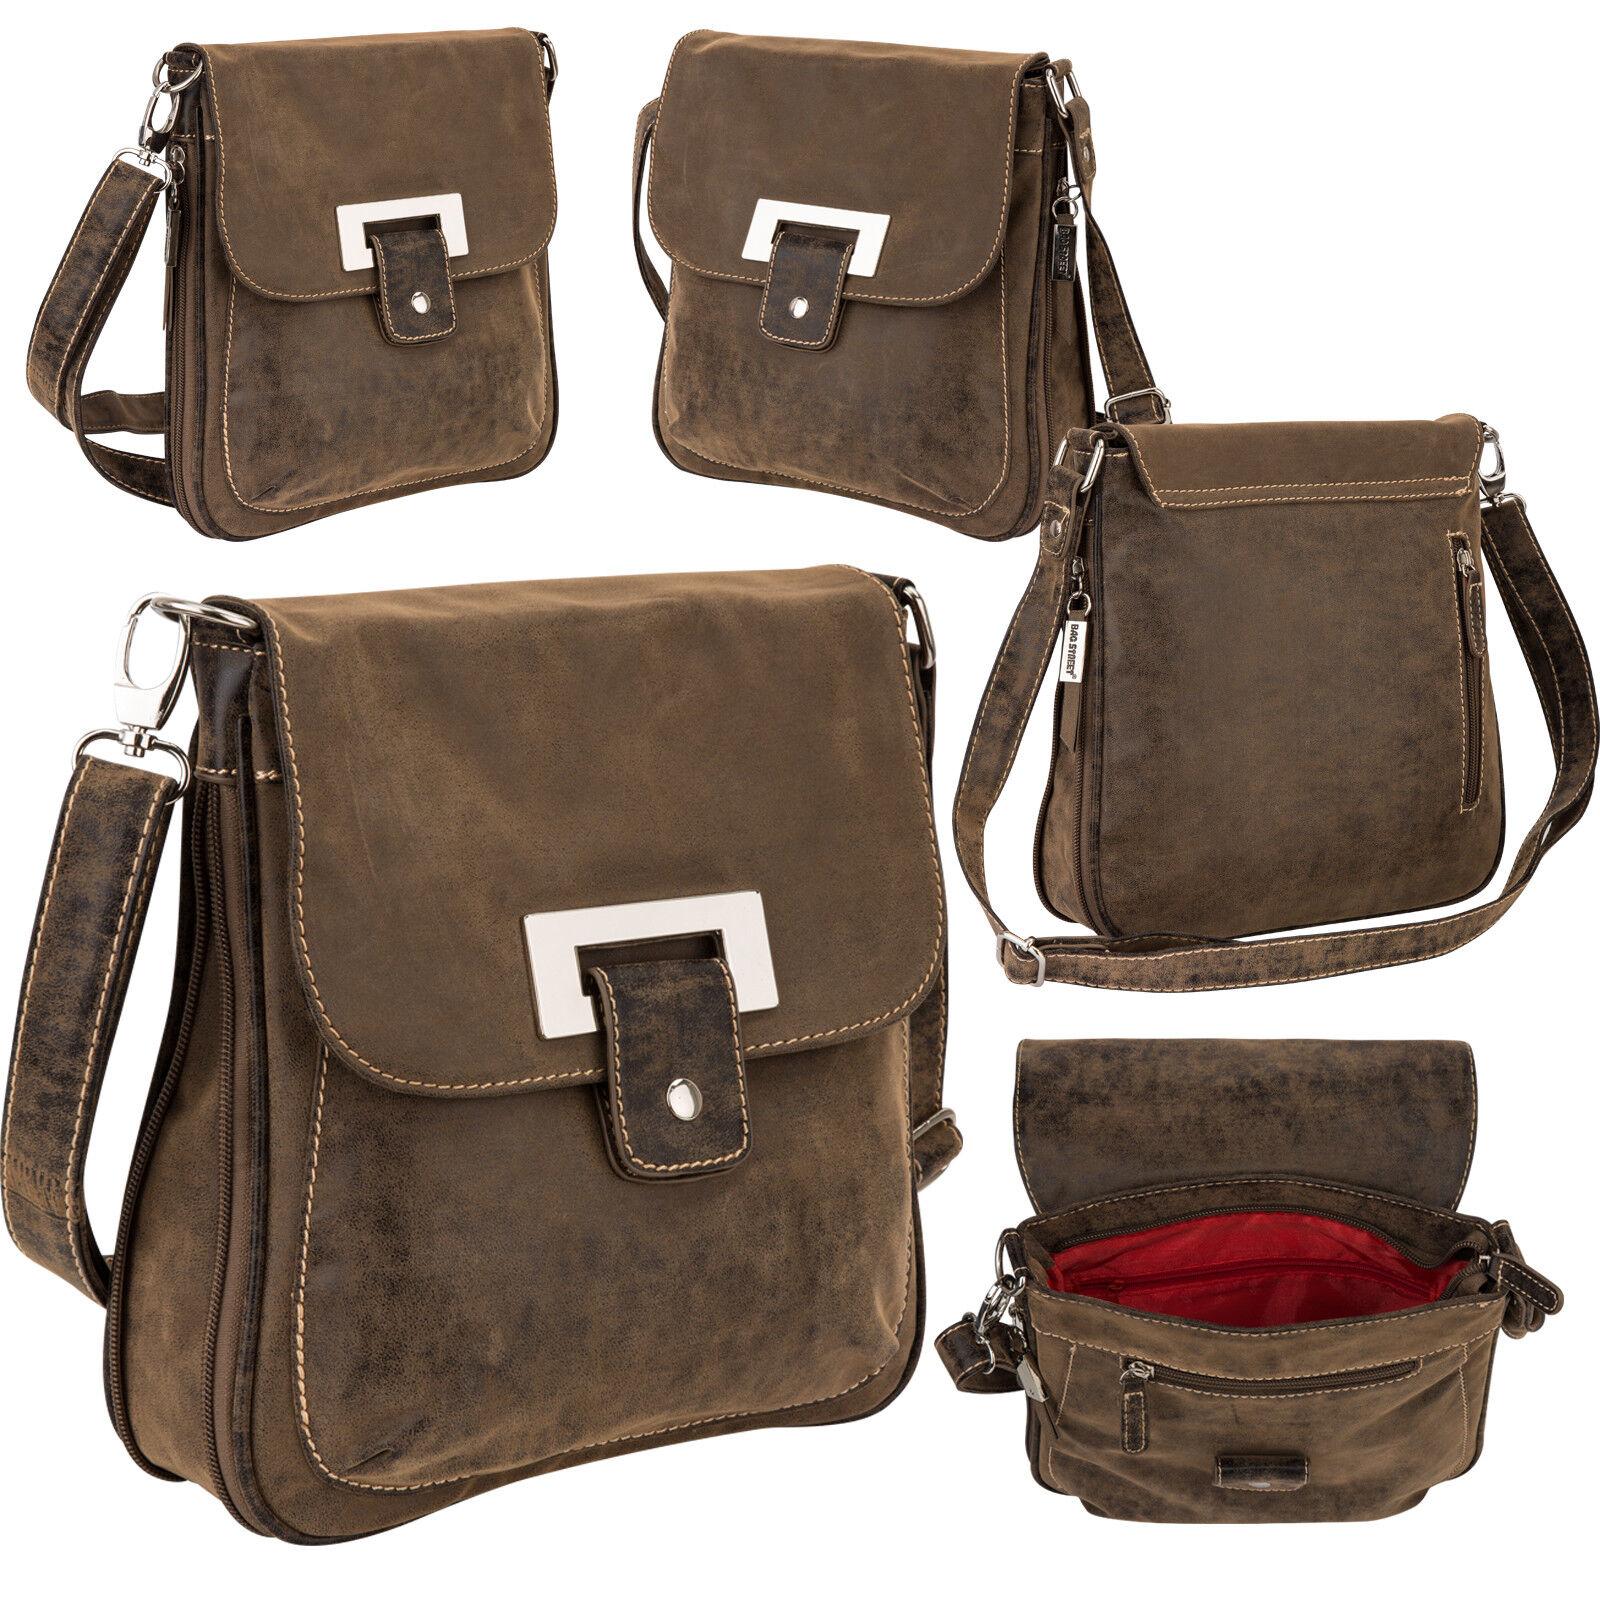 Bag Street Damentasche Umhängetasche Handtasche Schultertasche K2 T0135 Antikbraun